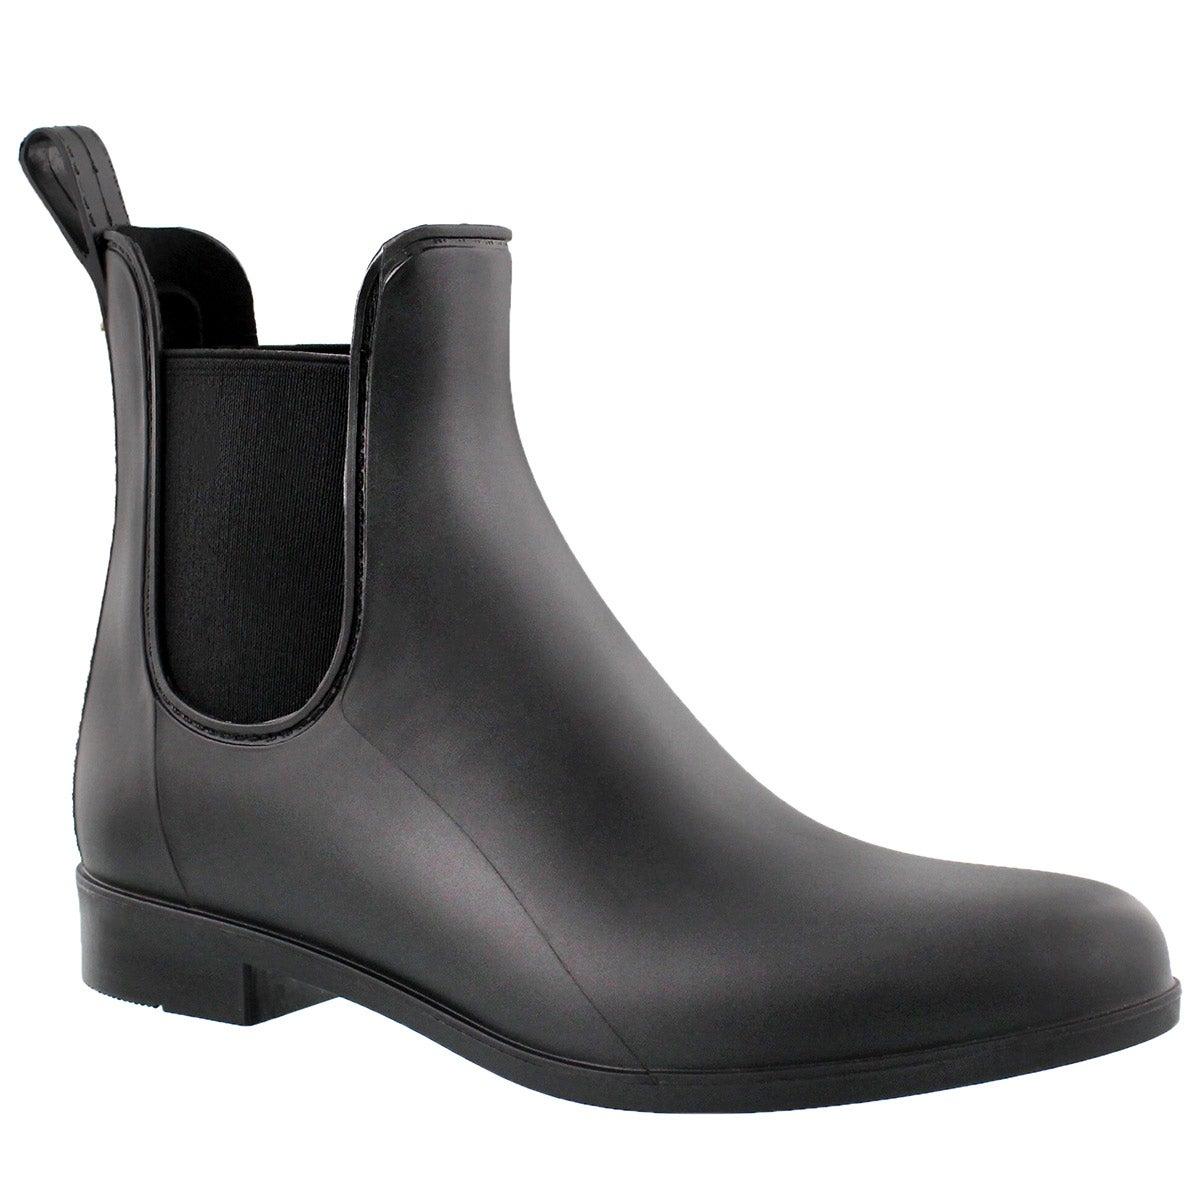 Lds Tinsley black matte rain boot